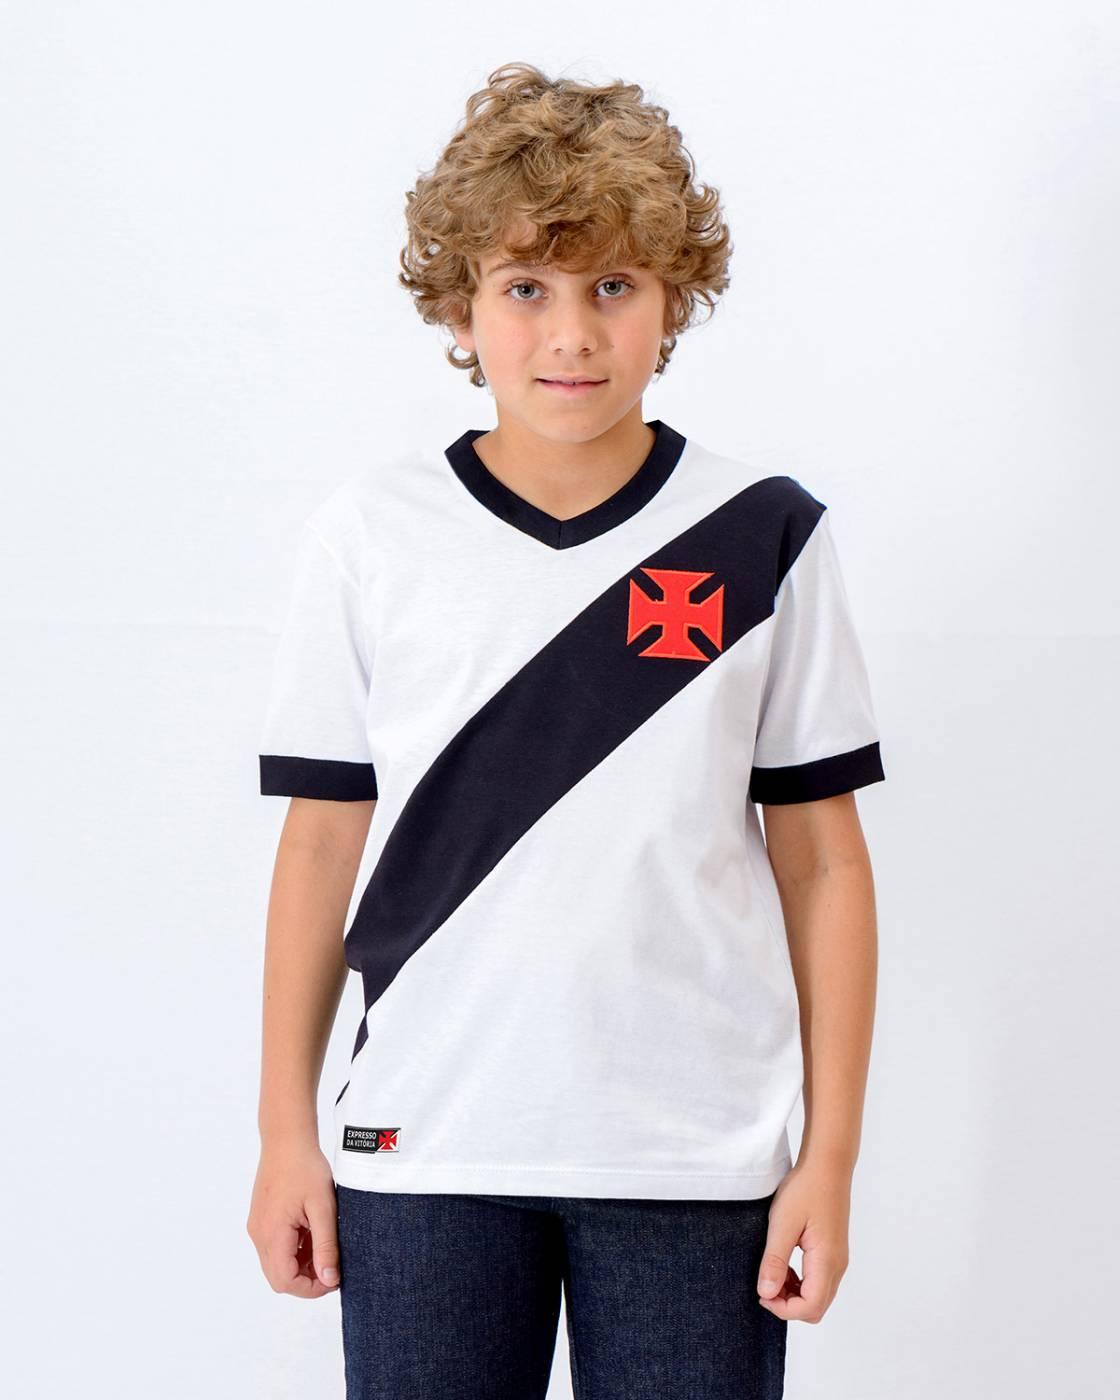 Camisa Vasco infantil Expresso